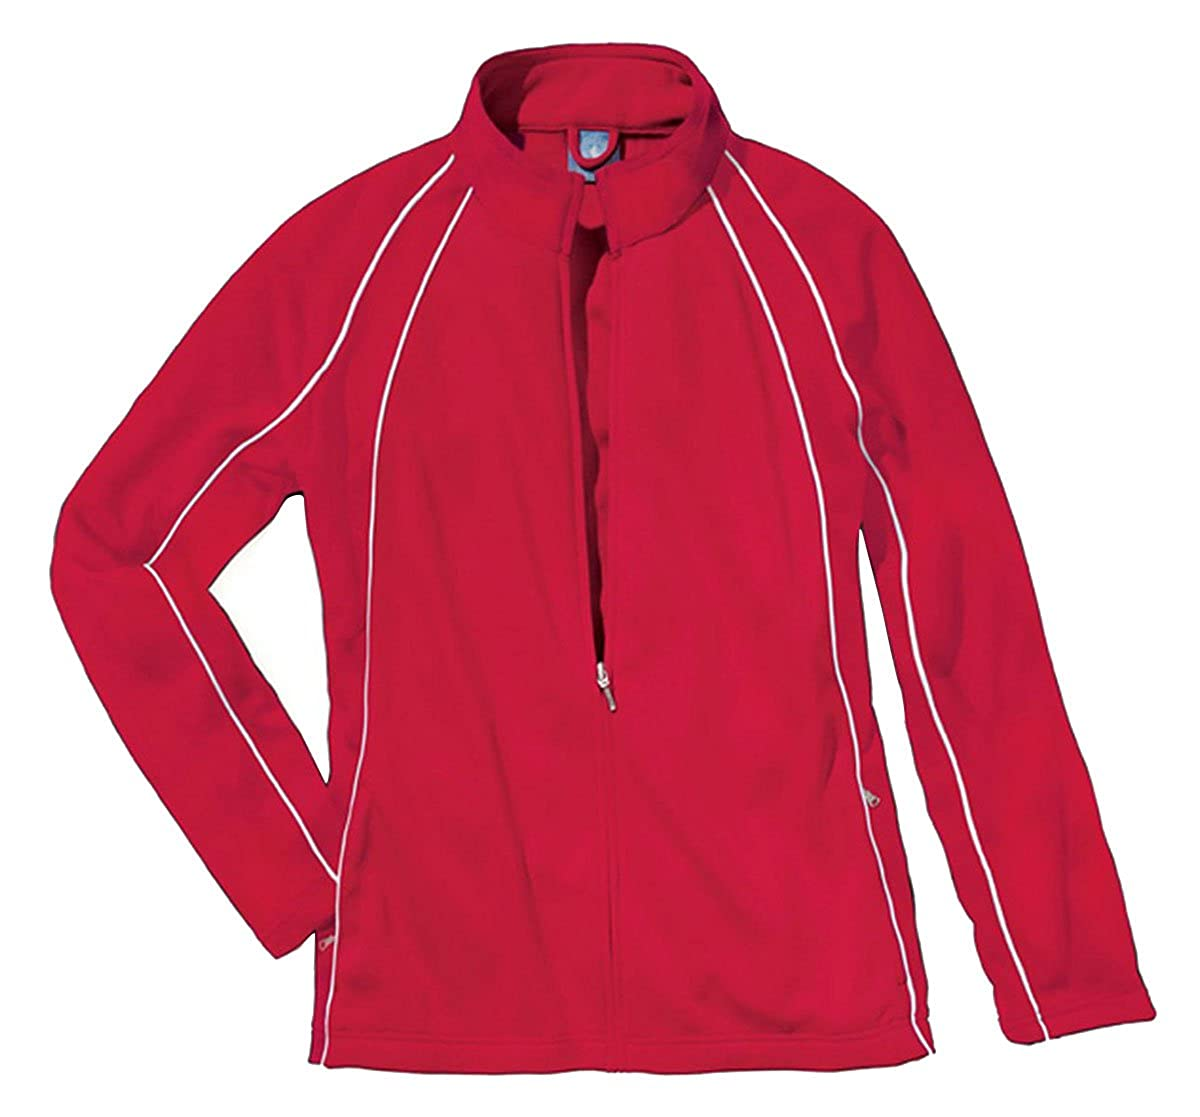 Charles River Girls Olympian Jacket